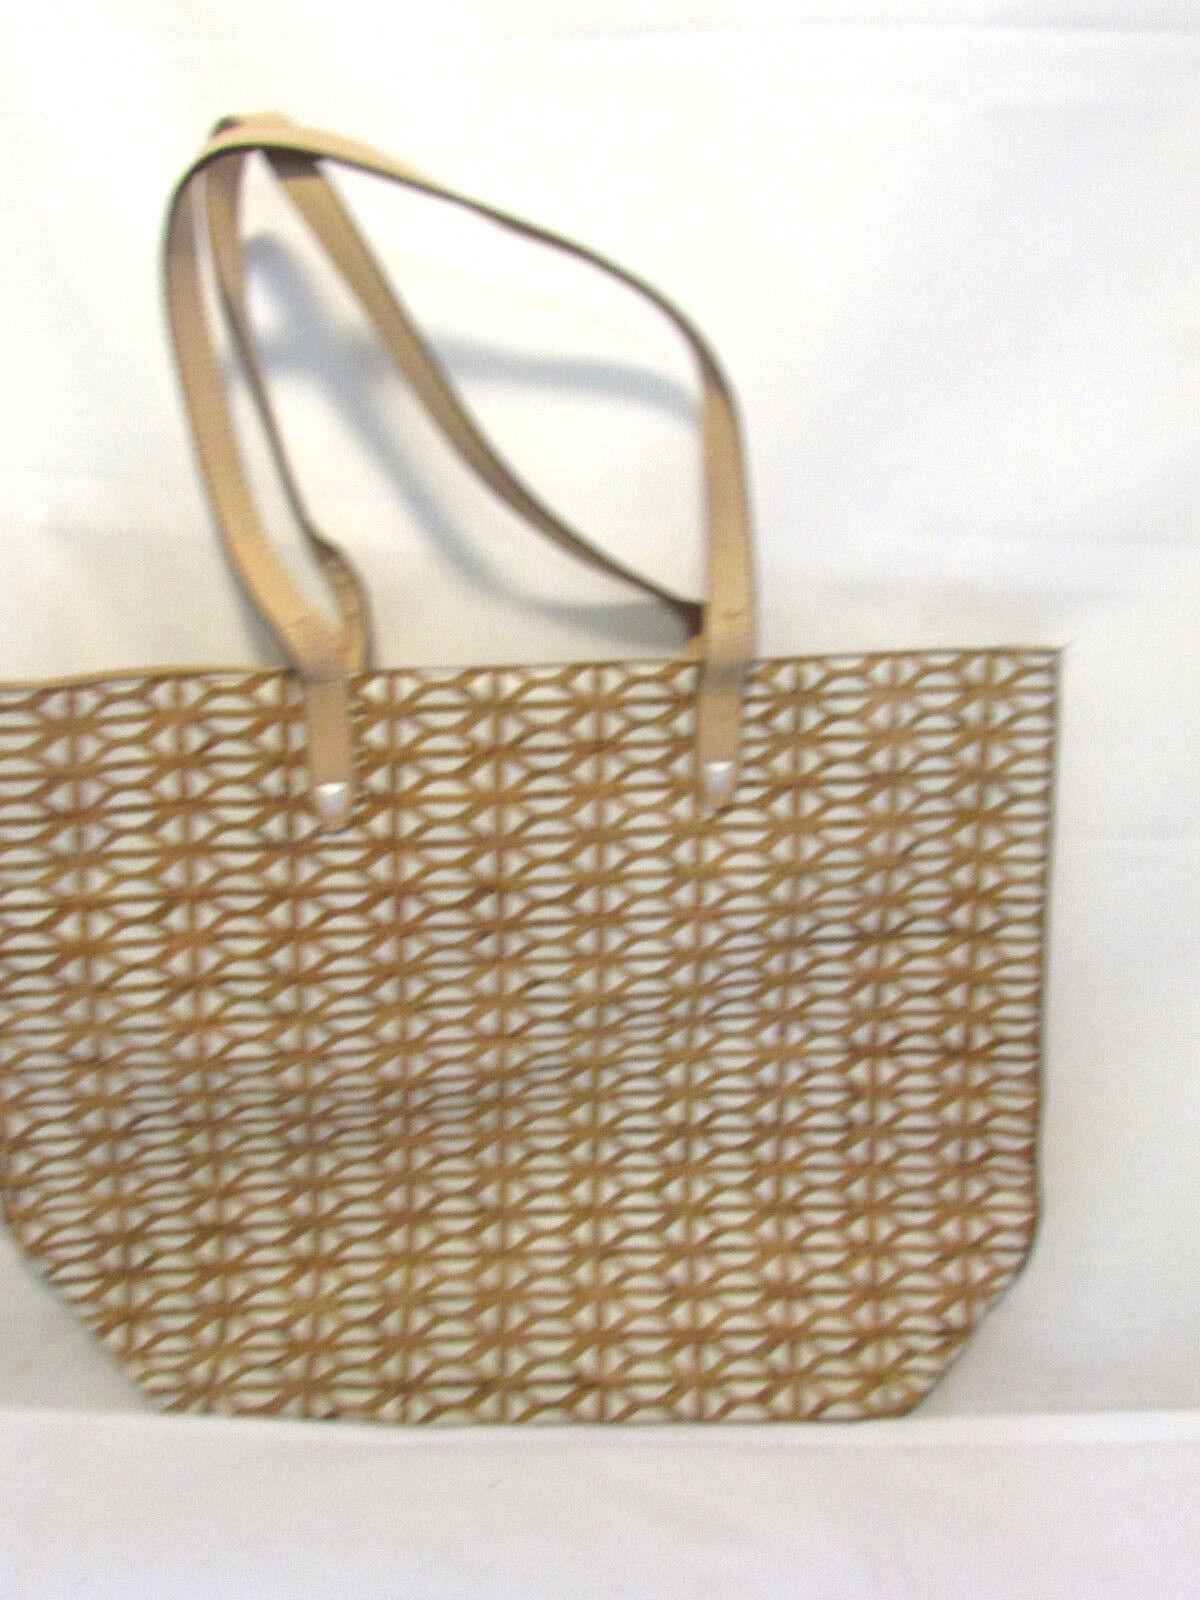 Stella & Dot Tote Fillmore Geometric Wine Cork Pattern Handbag Purse